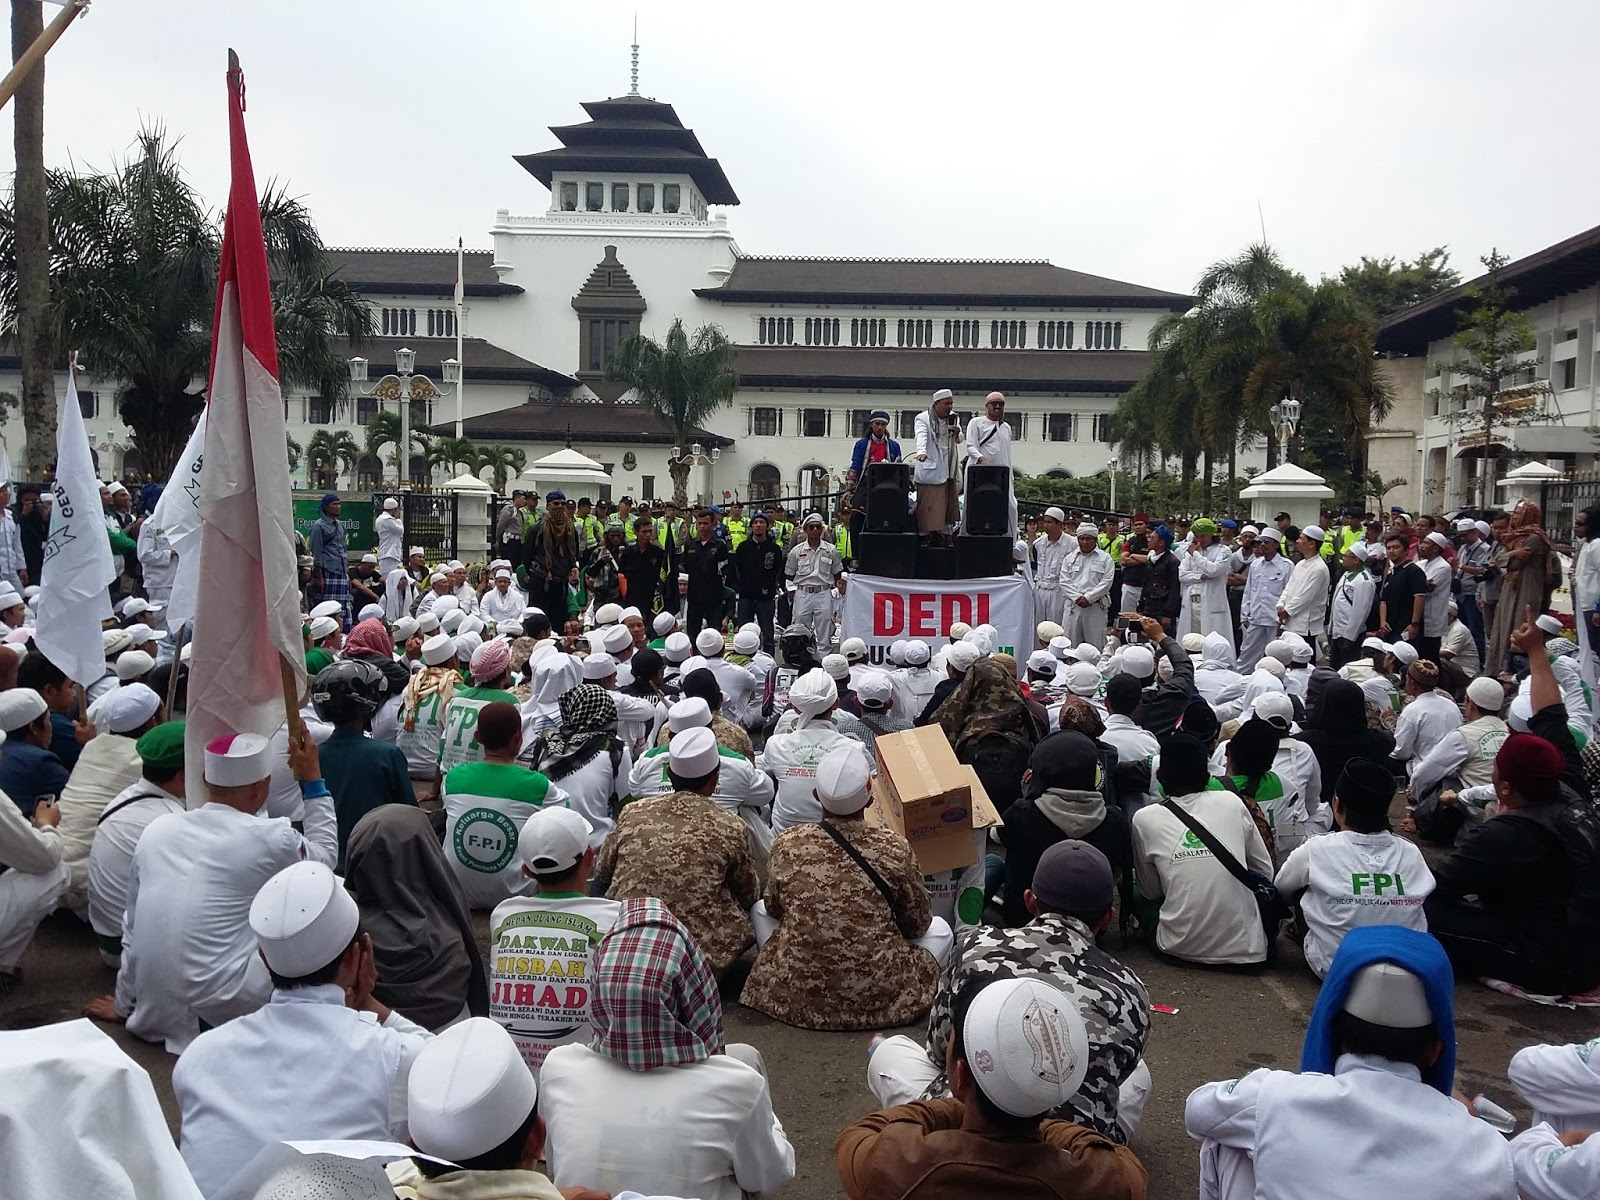 Fpi Demo Bupati Purwakarta Dedi Mulyadi Gedung Sate Seputar Sjo